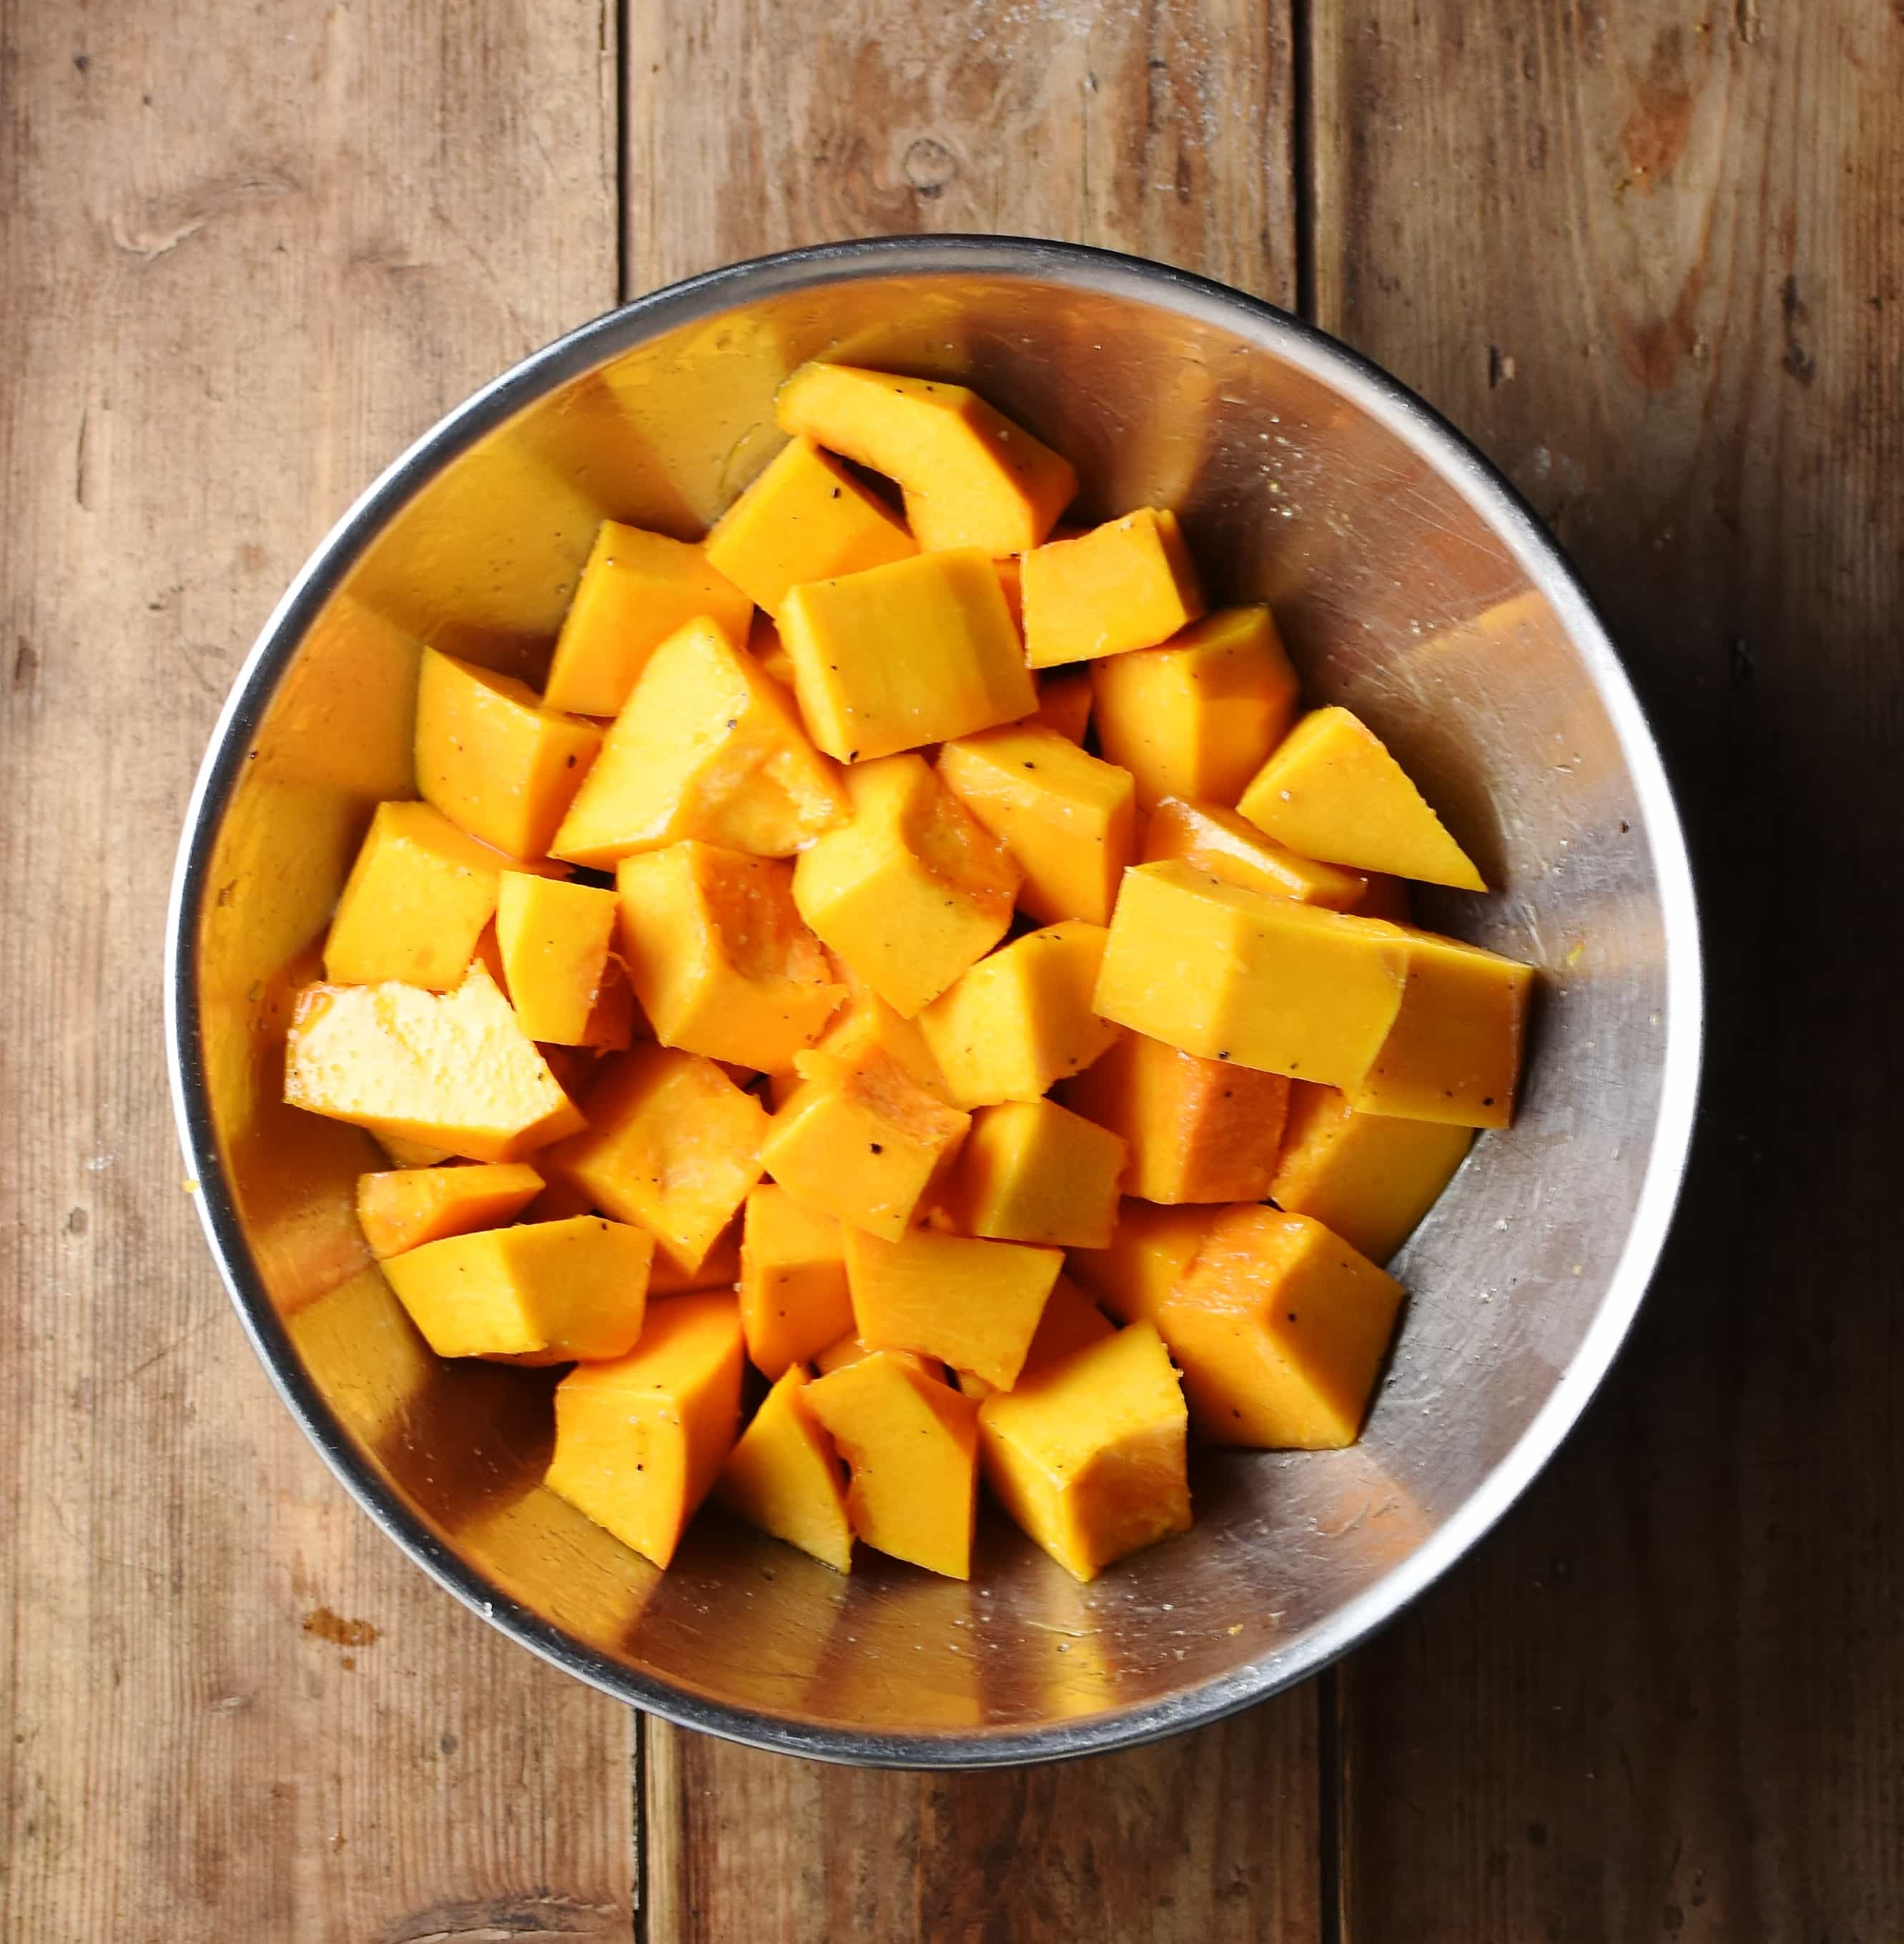 Pumpkin cubes in large metal bowl.